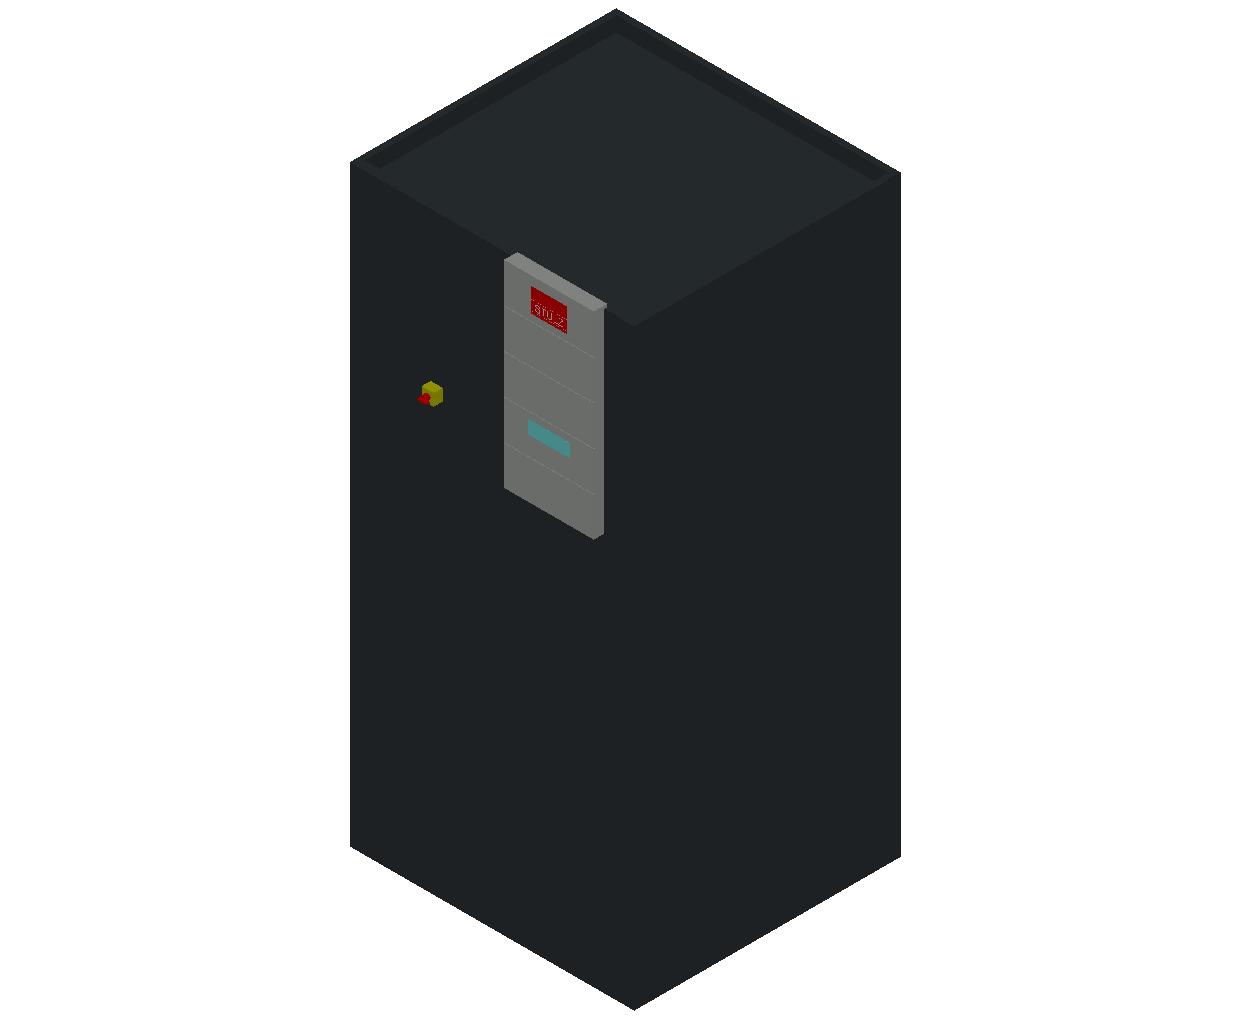 HC_Air Conditioner_Indoor Unit_MEPcontent_STULZ_CyberAir 3PRO_ASD-ALD_Single Circuit GE_ASD_171_GE_INT-EN.dwg